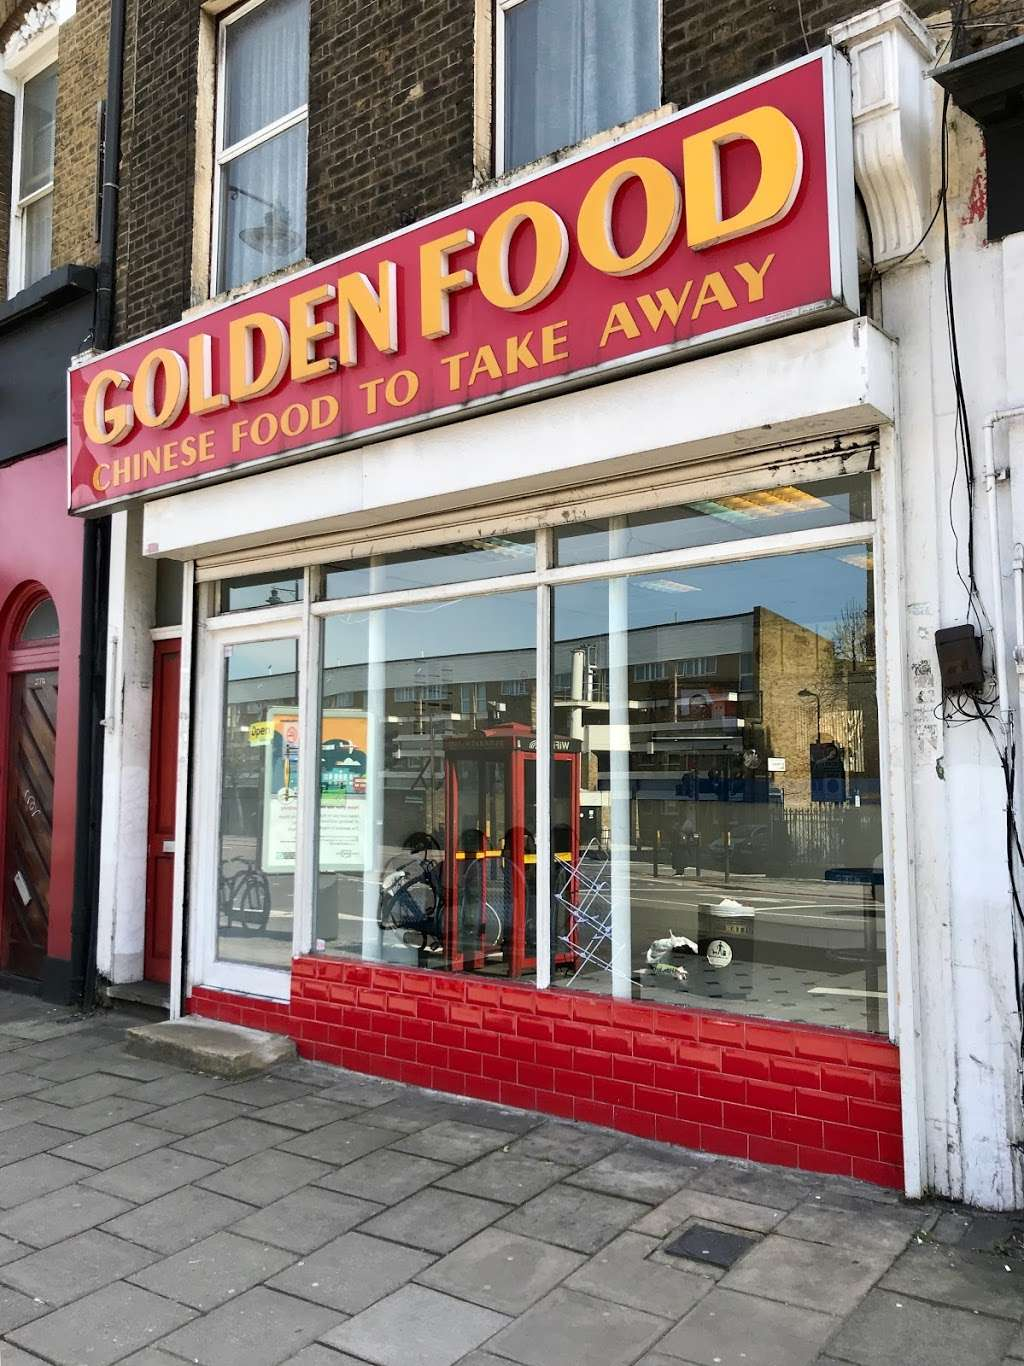 Golden Food Chinese Takeaway - meal takeaway    Photo 1 of 3   Address: 368 Kingsland Rd, London E8 4DA, UK   Phone: 020 7249 0942